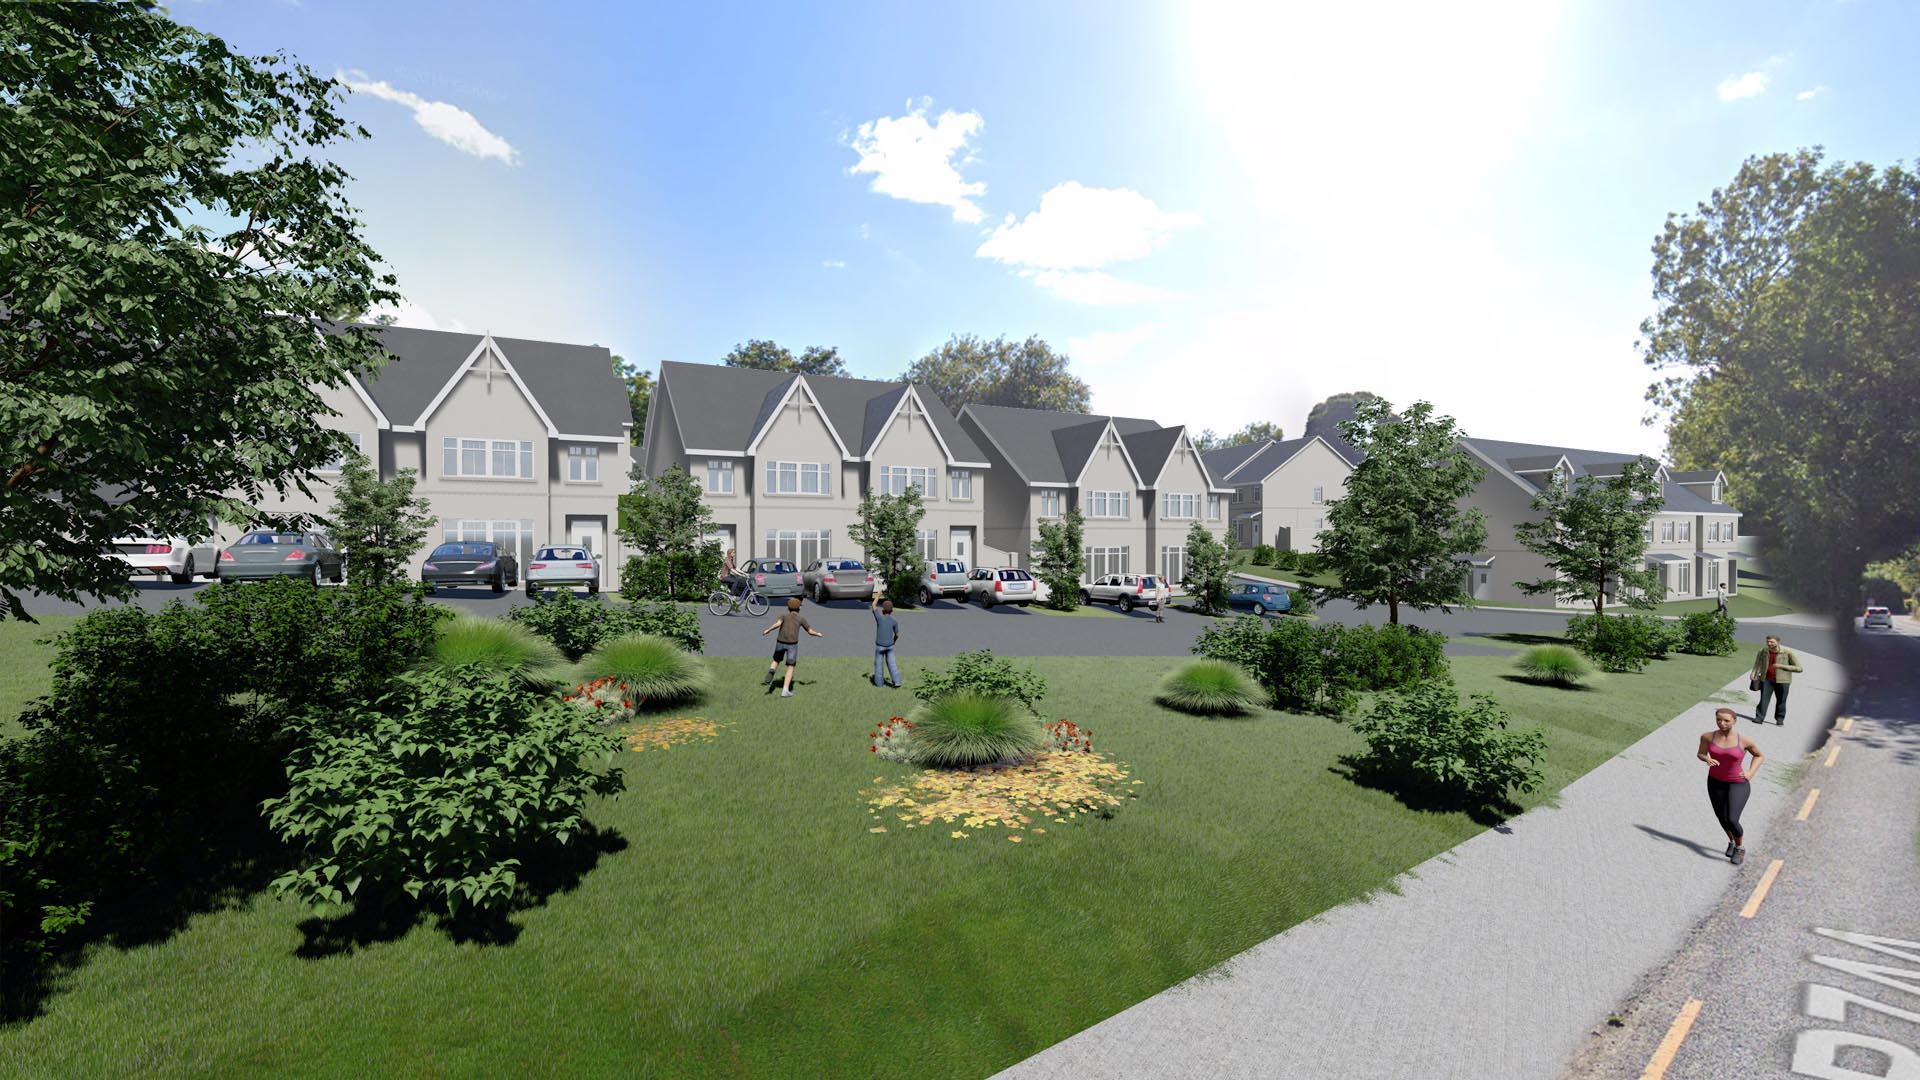 Enniscorthy residential development